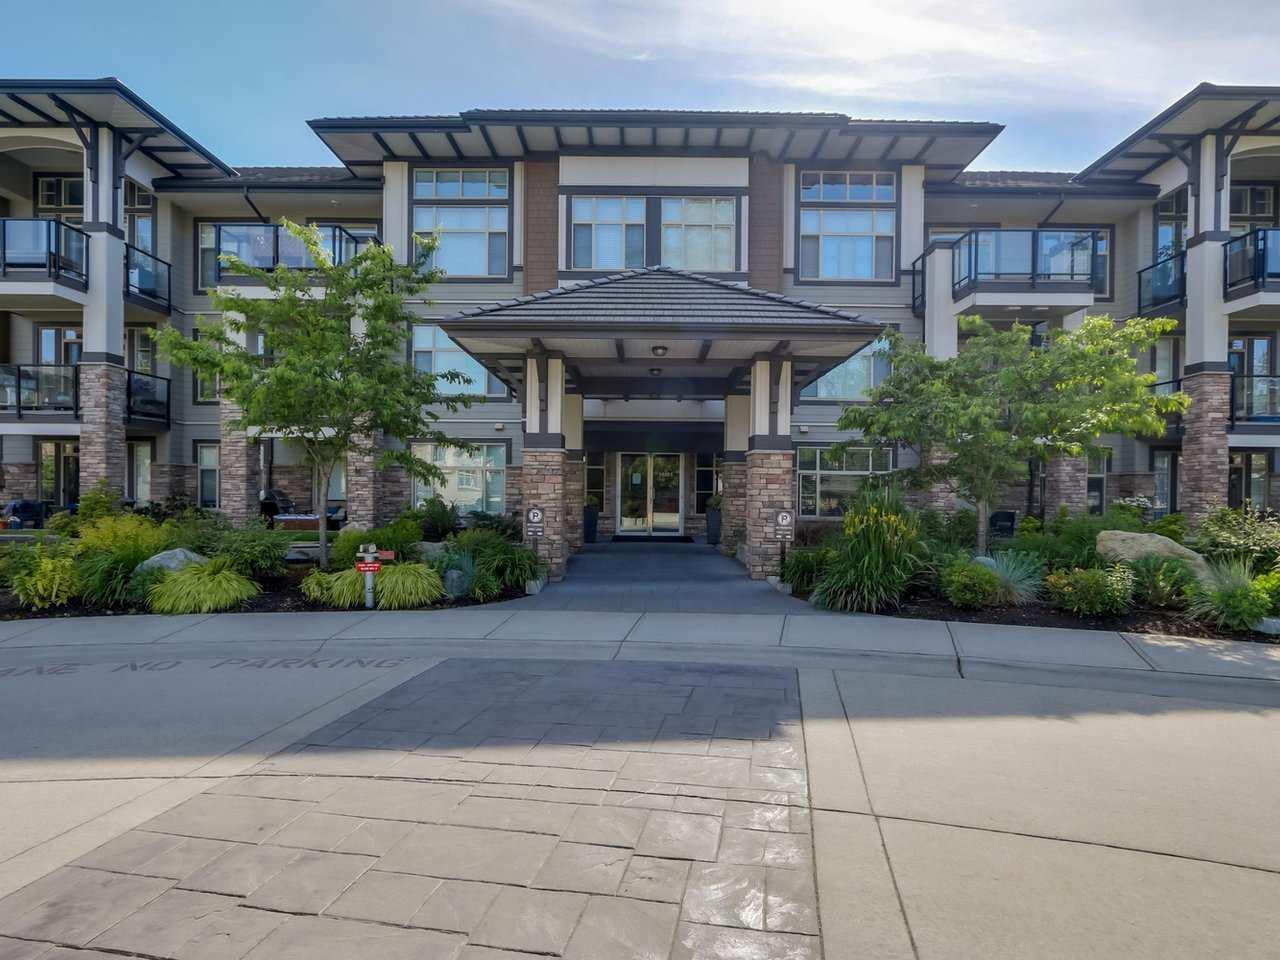 Condo Apartment at 206 15185 36 AVENUE, Unit 206, South Surrey White Rock, British Columbia. Image 1